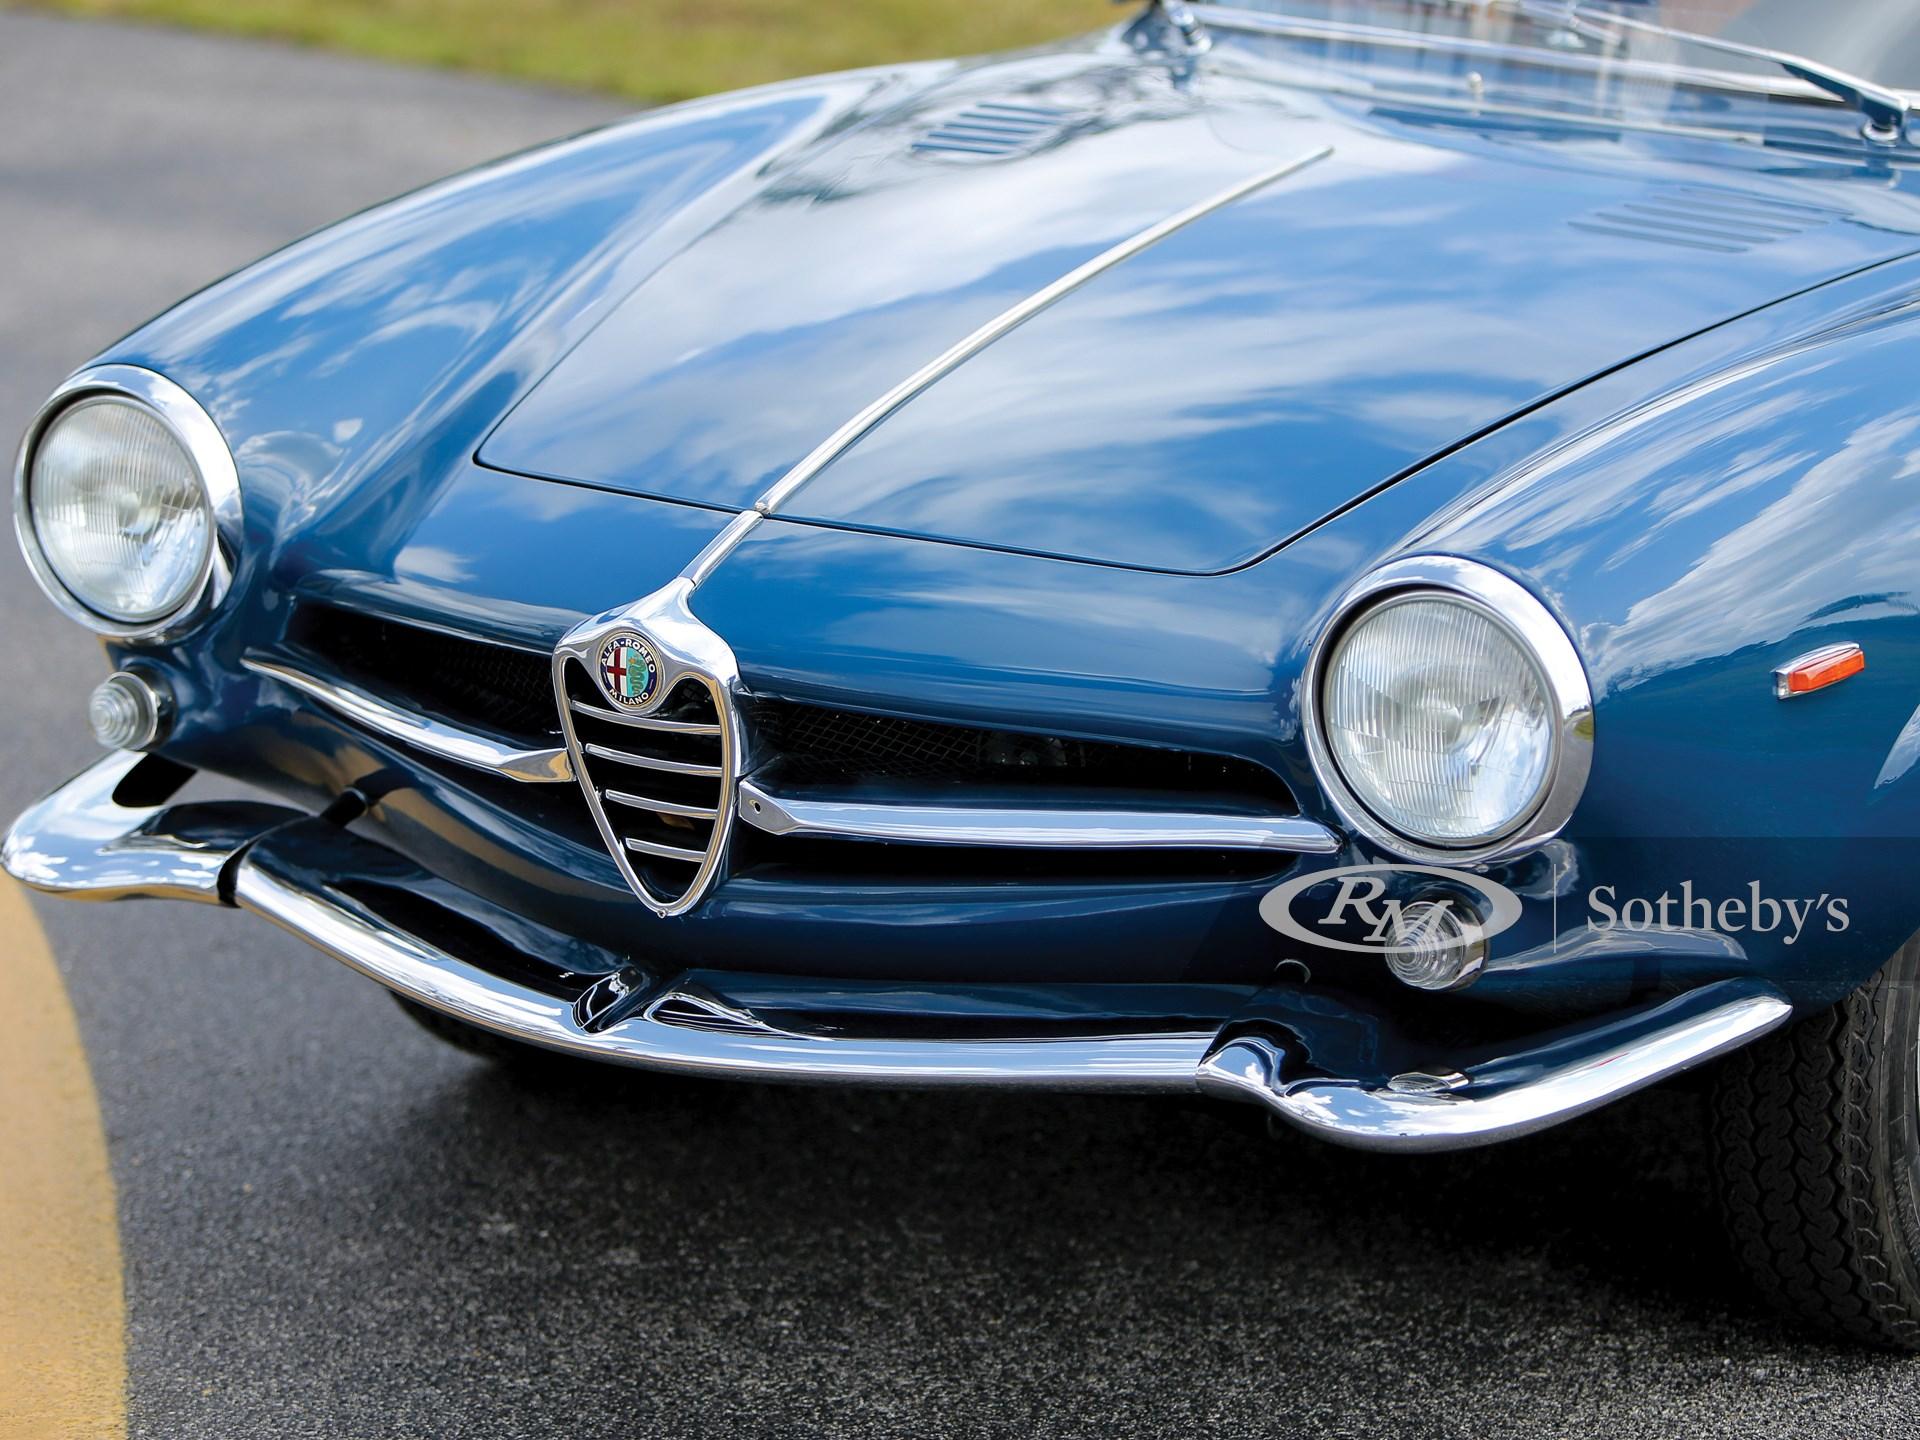 1965 Alfa Romeo Giulia Sprint Speciale by Bertone -